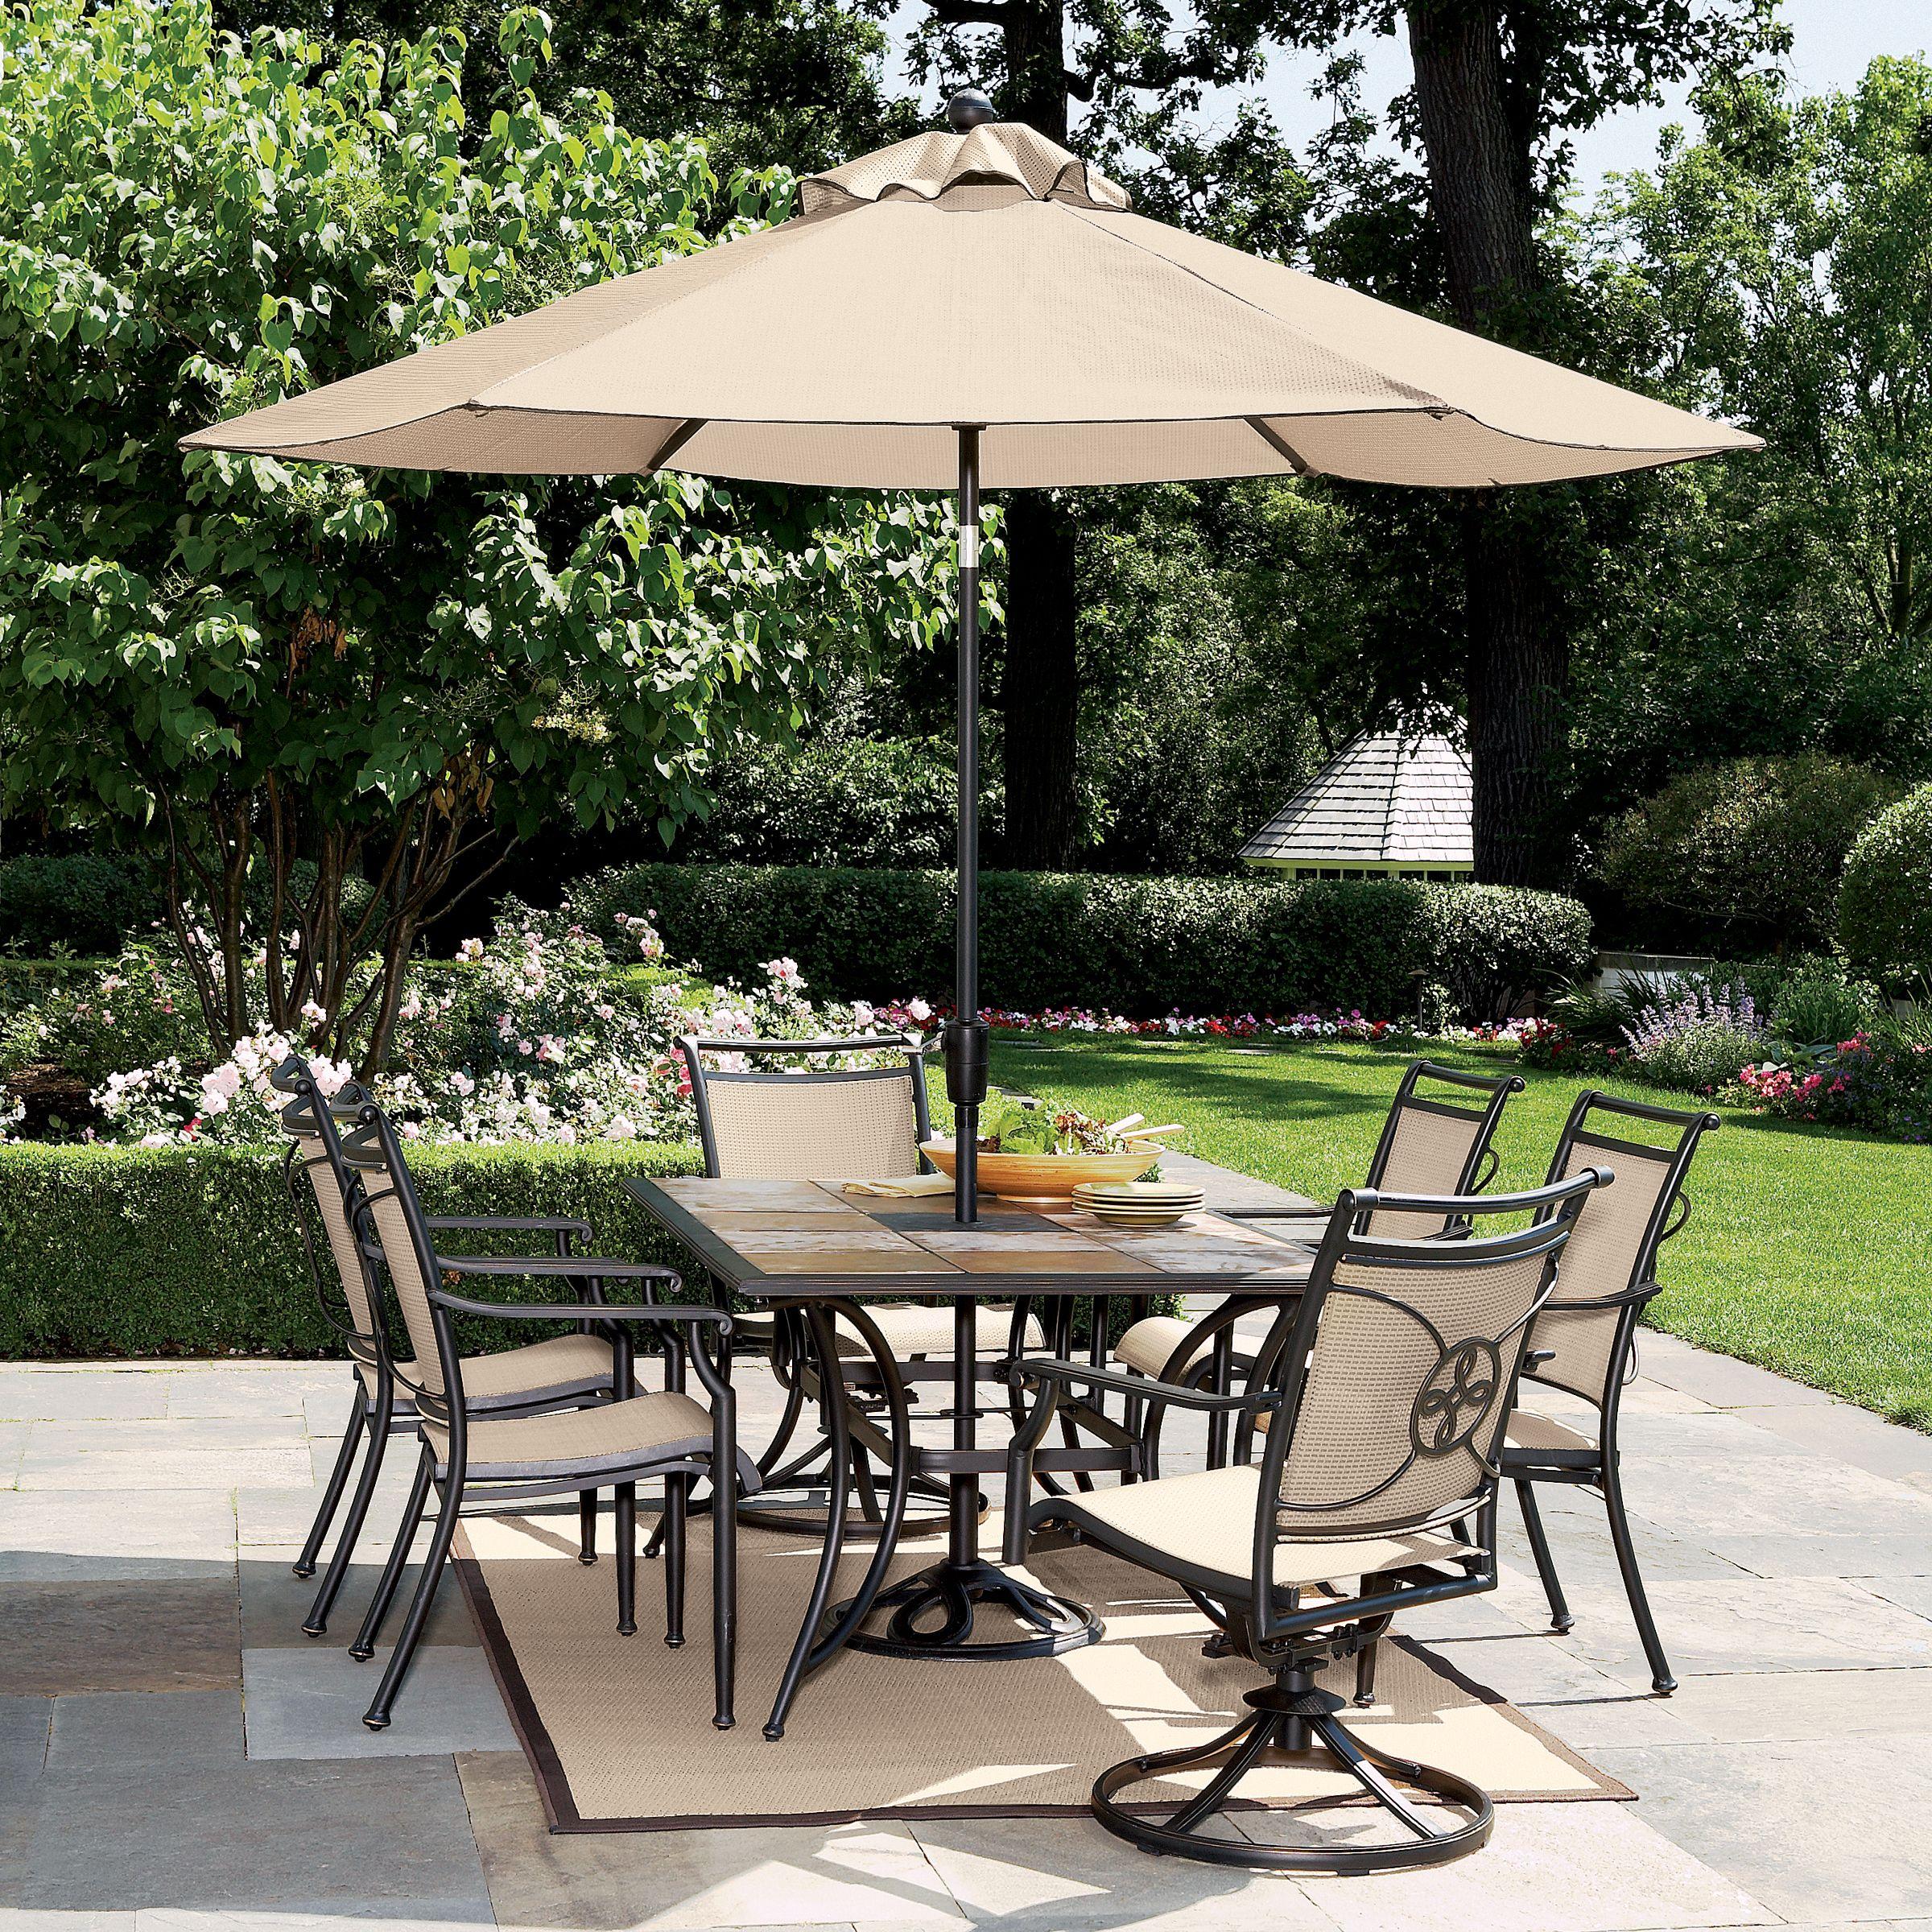 Garden Oasis - S50-449907-4064-3 River Stone 7 Pc